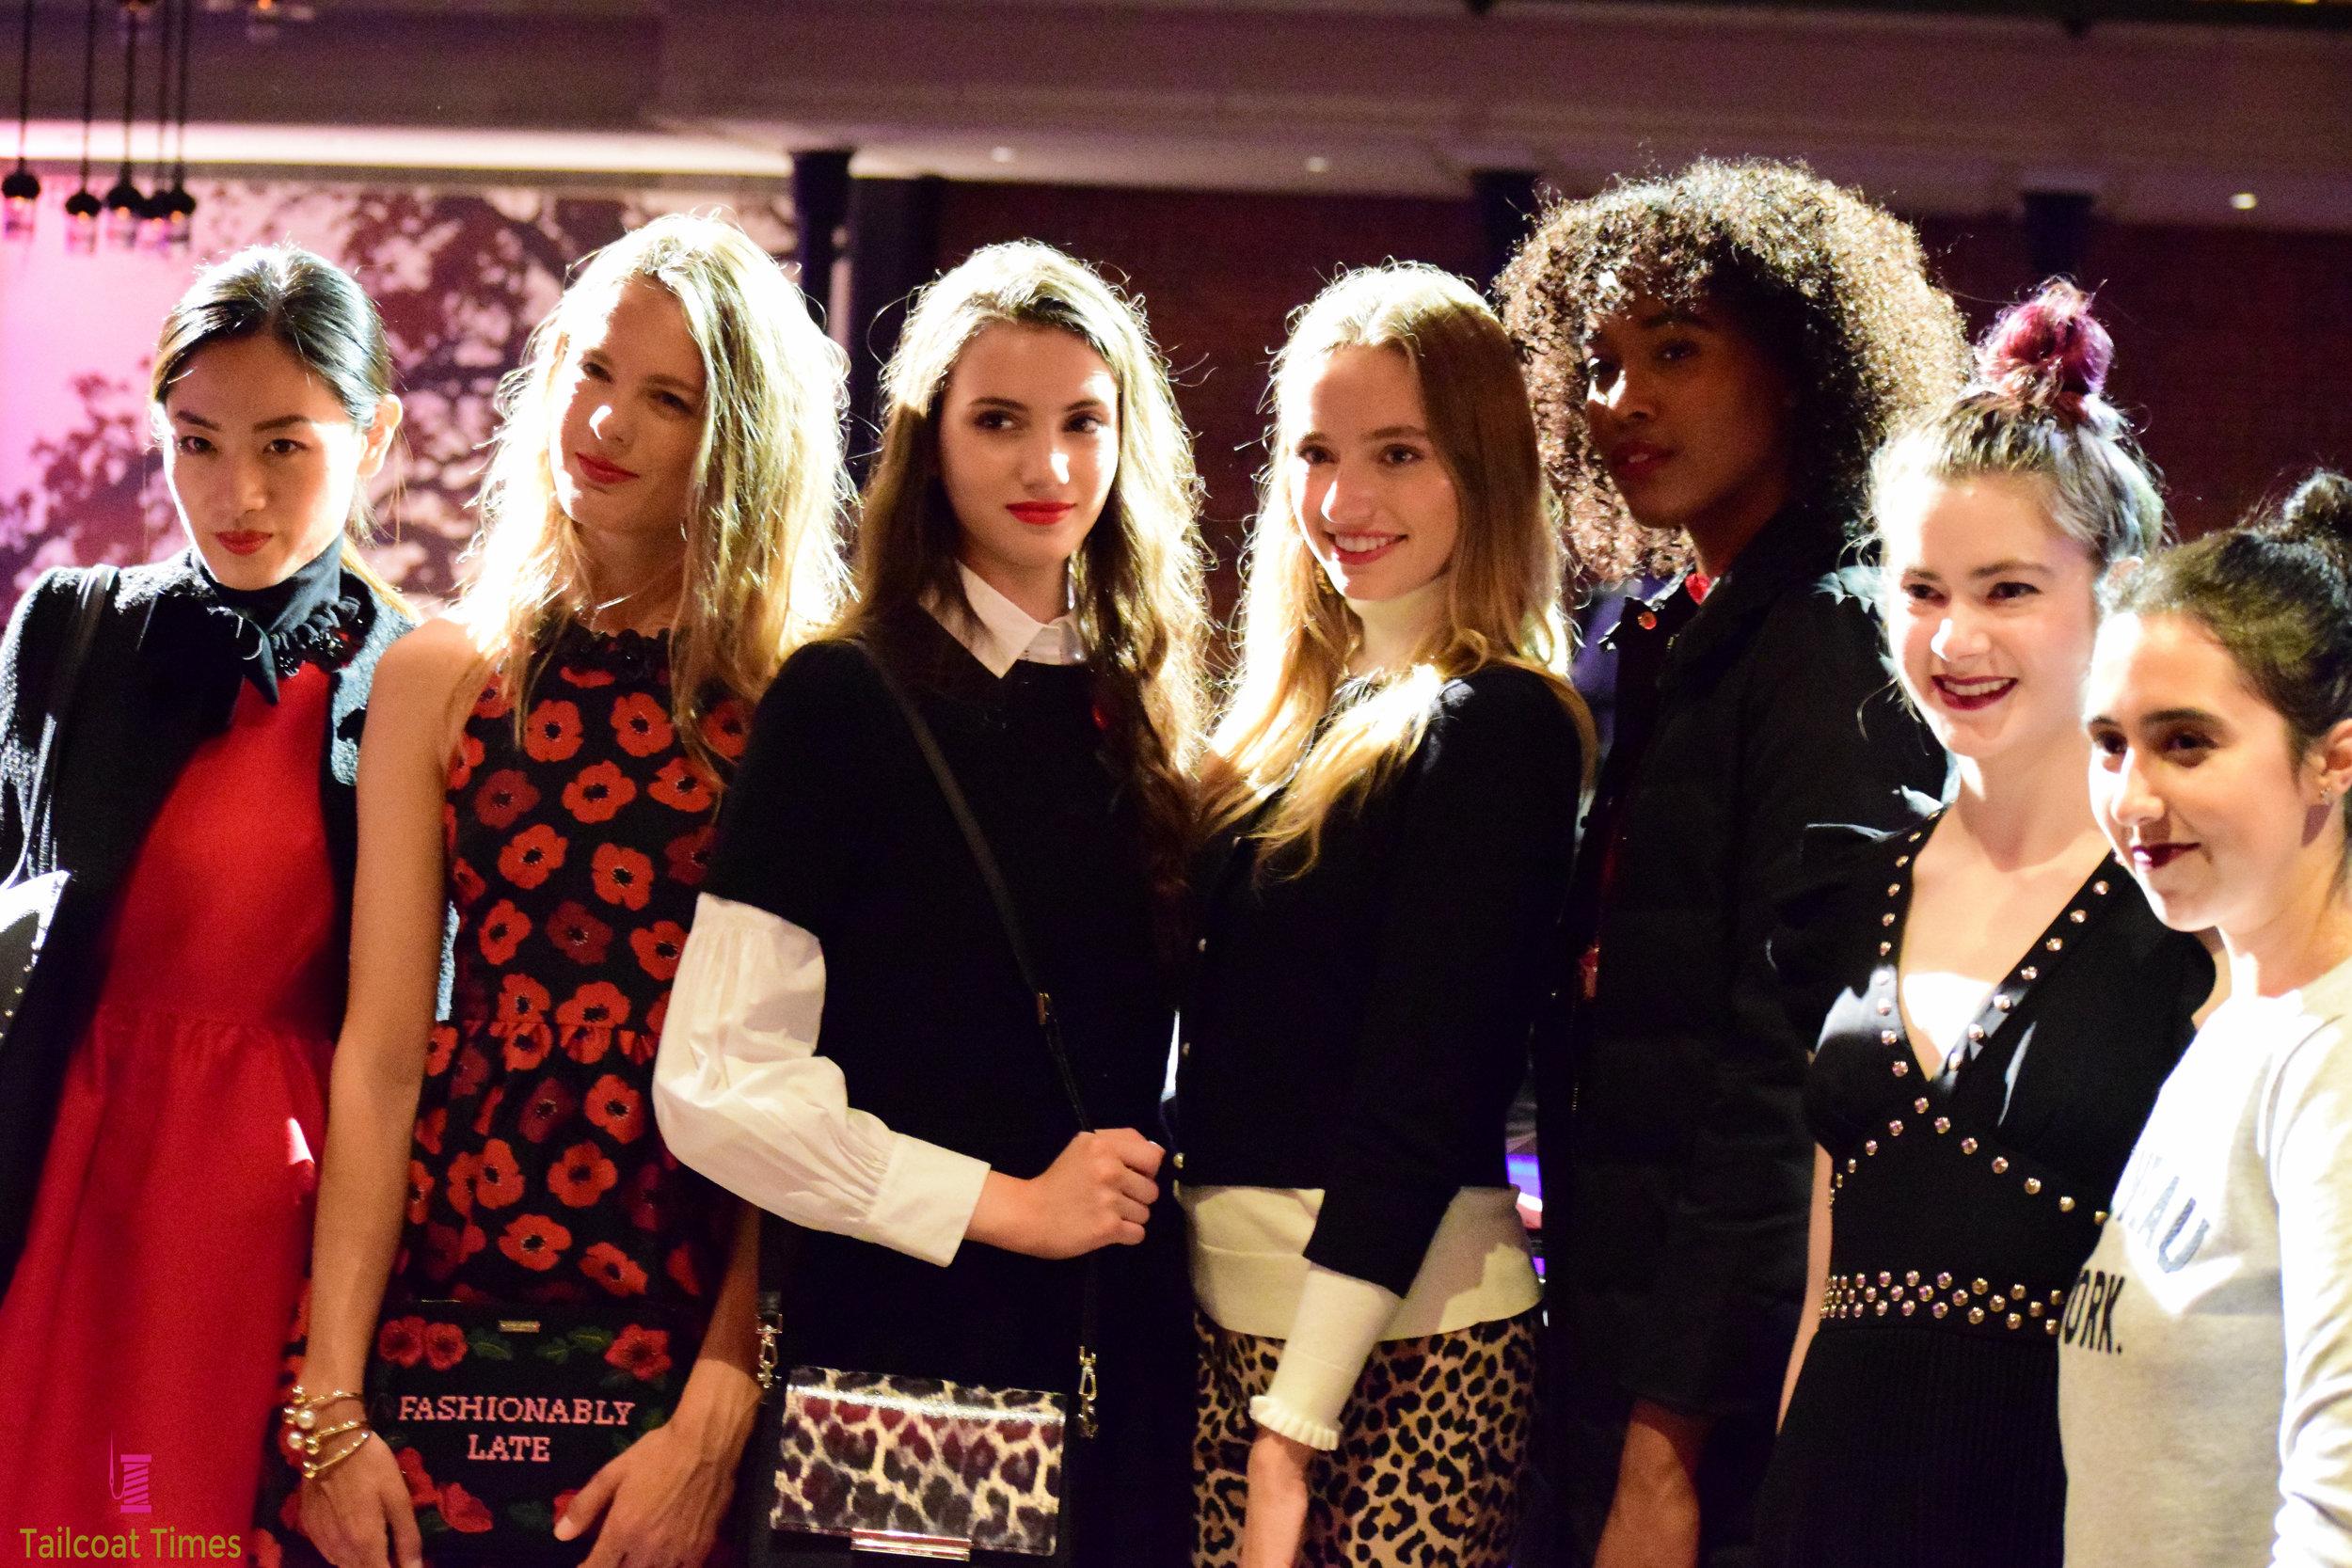 FashionablyLate_Kate Spade_Tailcoat Times (10 of 23).jpg